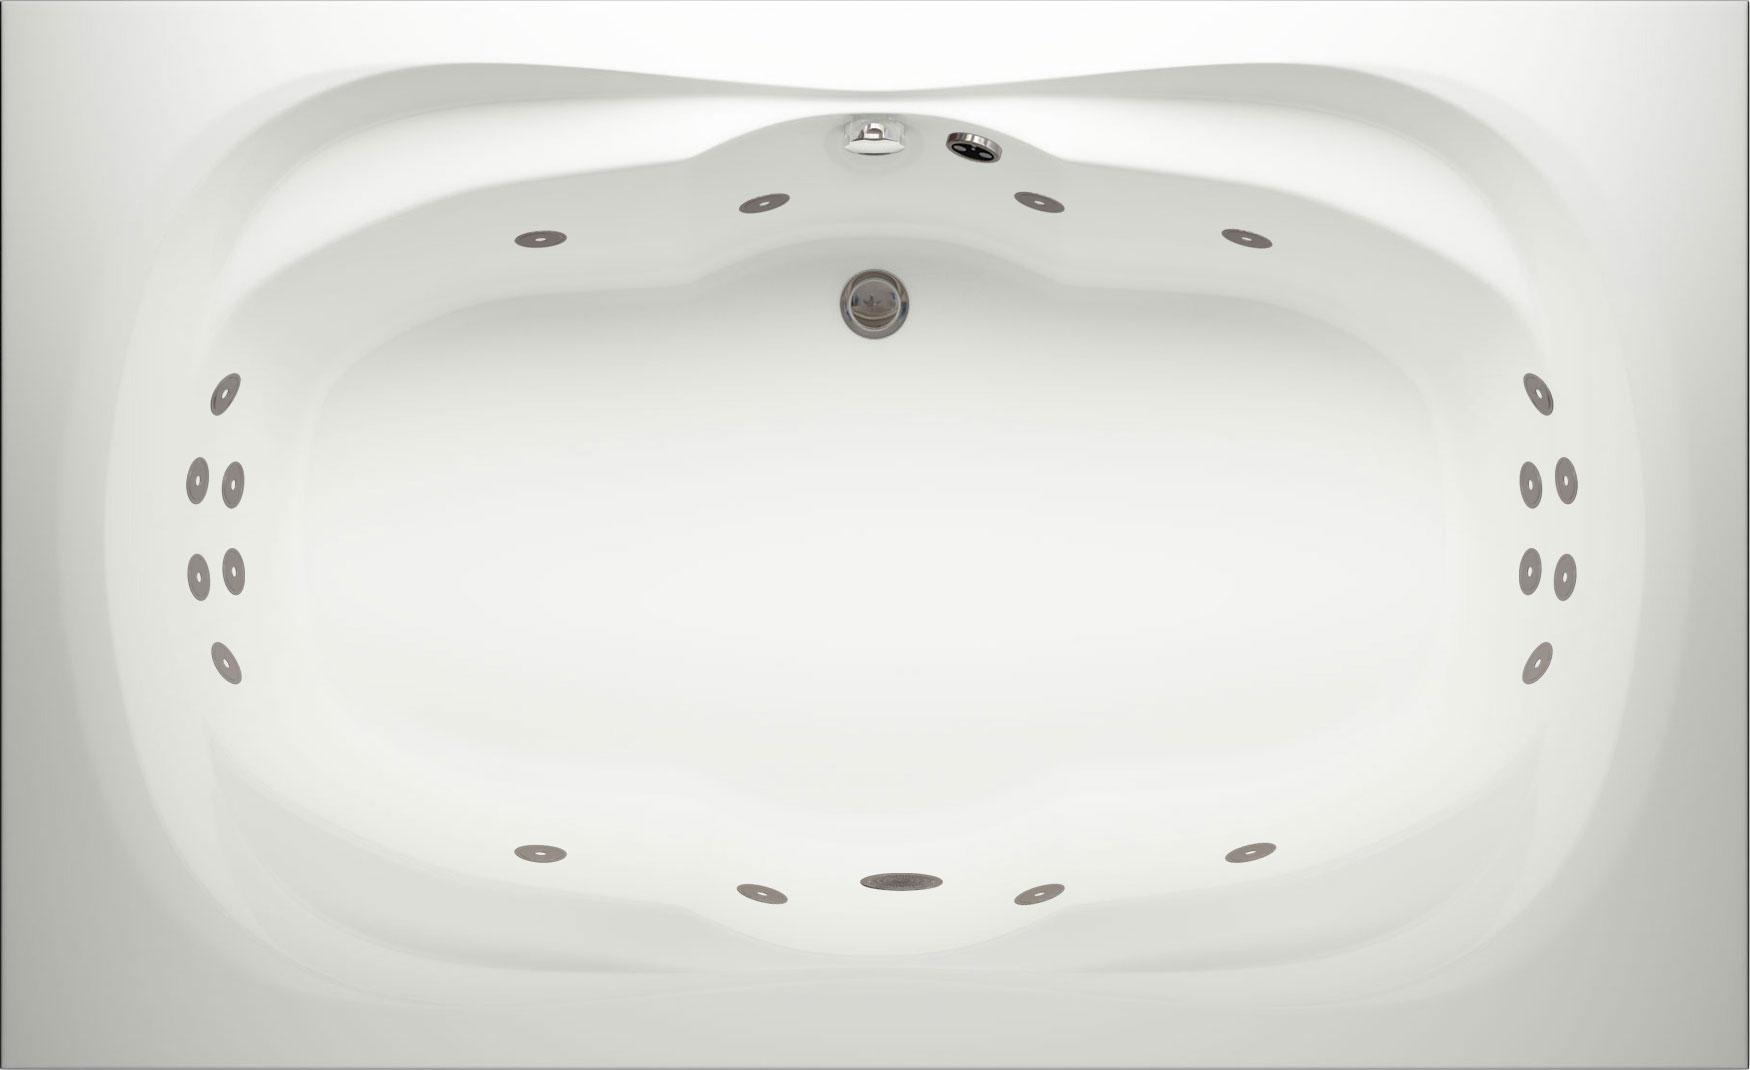 Ancona Super Lux Double Whirlpool Bath | Luna Spas